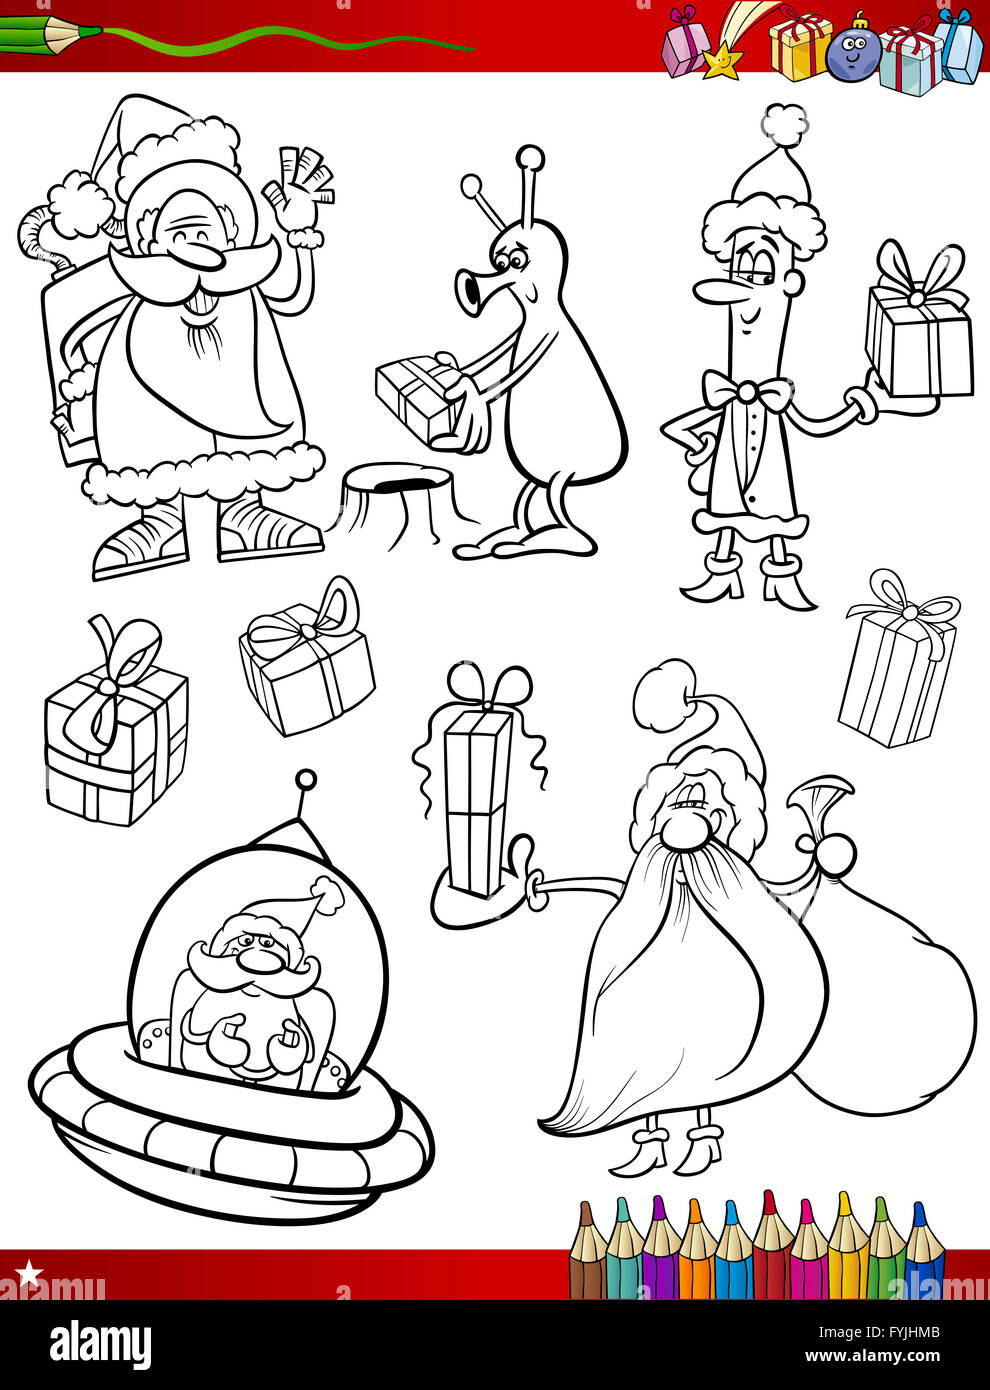 Cartoon Cute Elf Sack Stockfotos & Cartoon Cute Elf Sack Bilder - Alamy